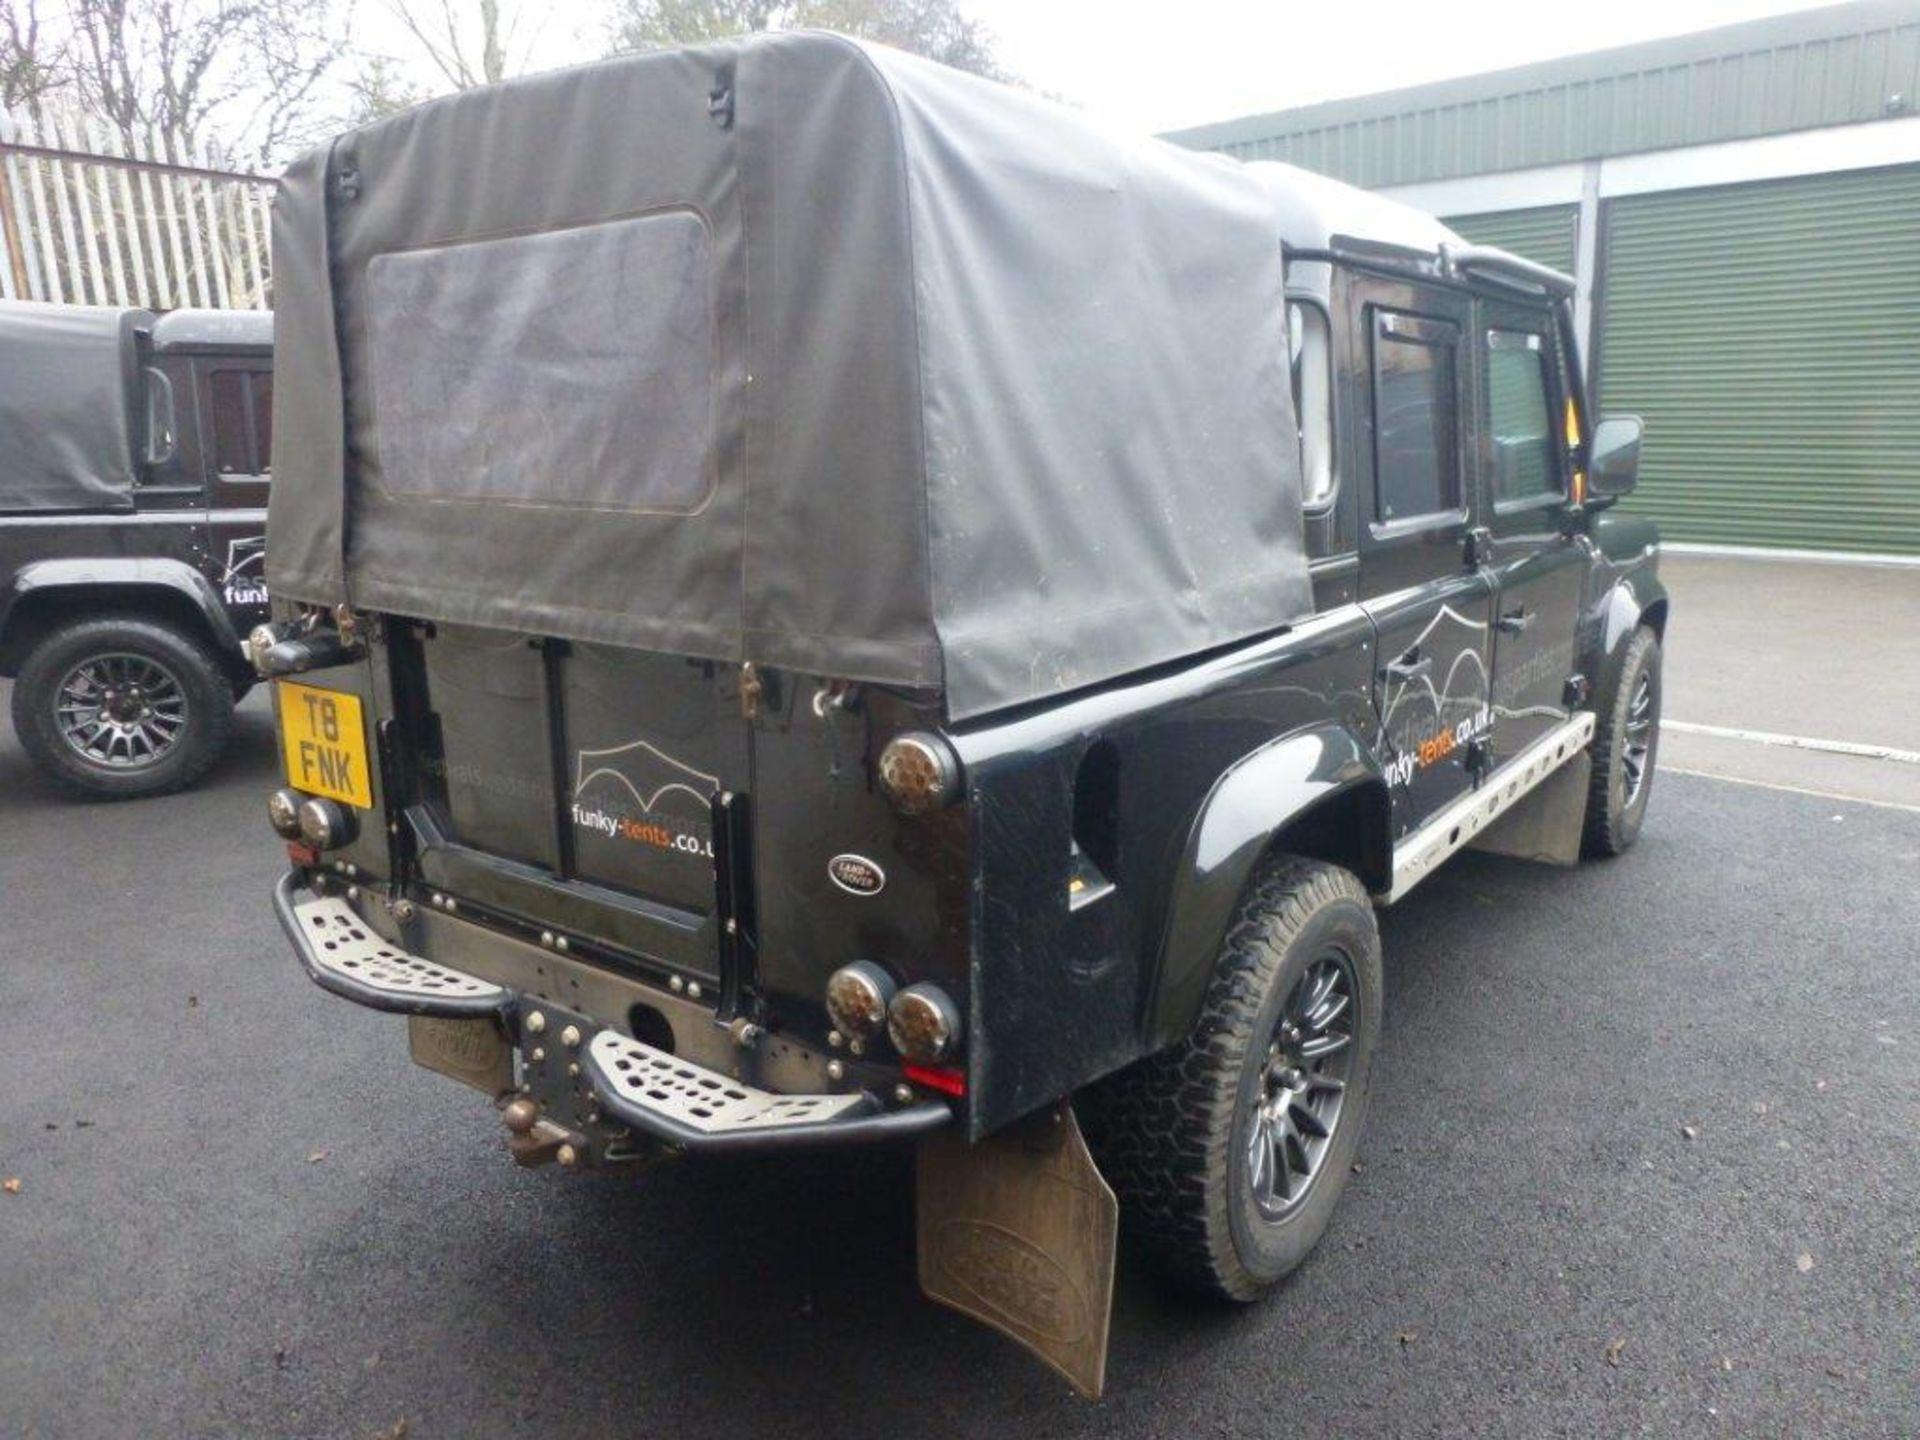 Land Rover Defender 110 XS Bowler double cab pickup TDCi (2.2). Reg no. FN15 LBK. Reg. date 23/03/ - Image 4 of 12